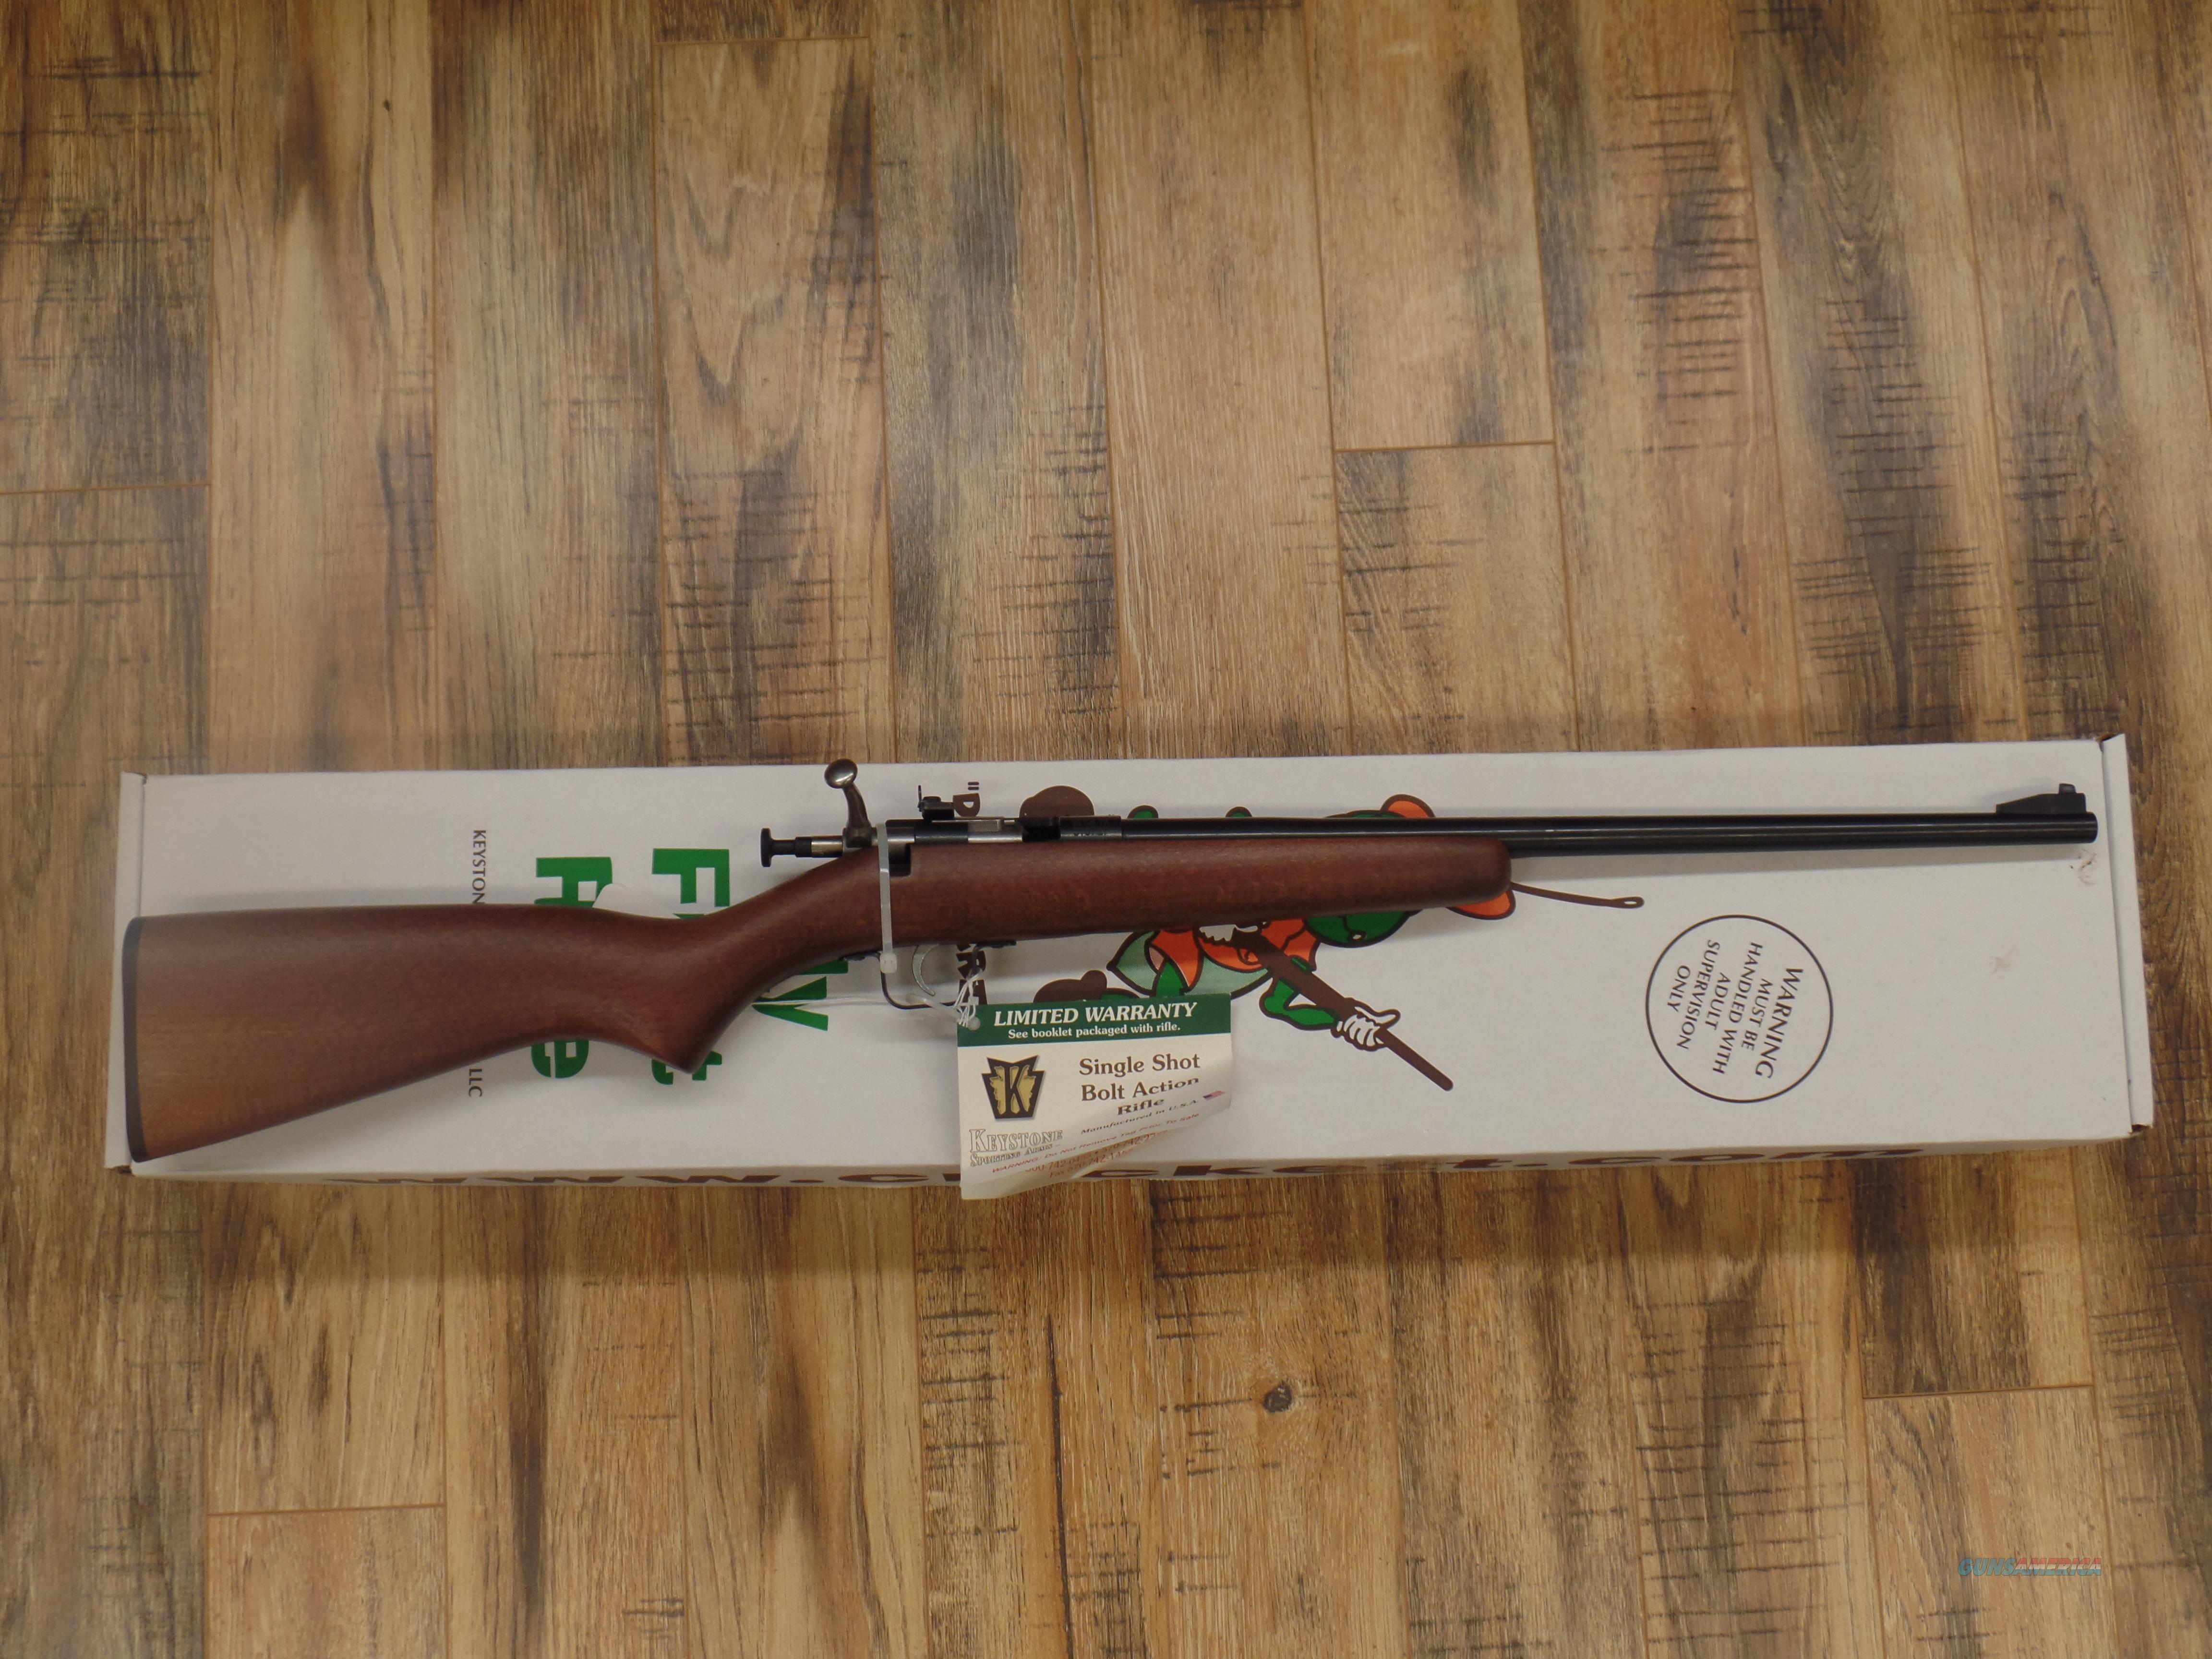 Keystone Arms Crickett Wood (22 LR)  Guns > Rifles > Crickett-Keystone Rifles